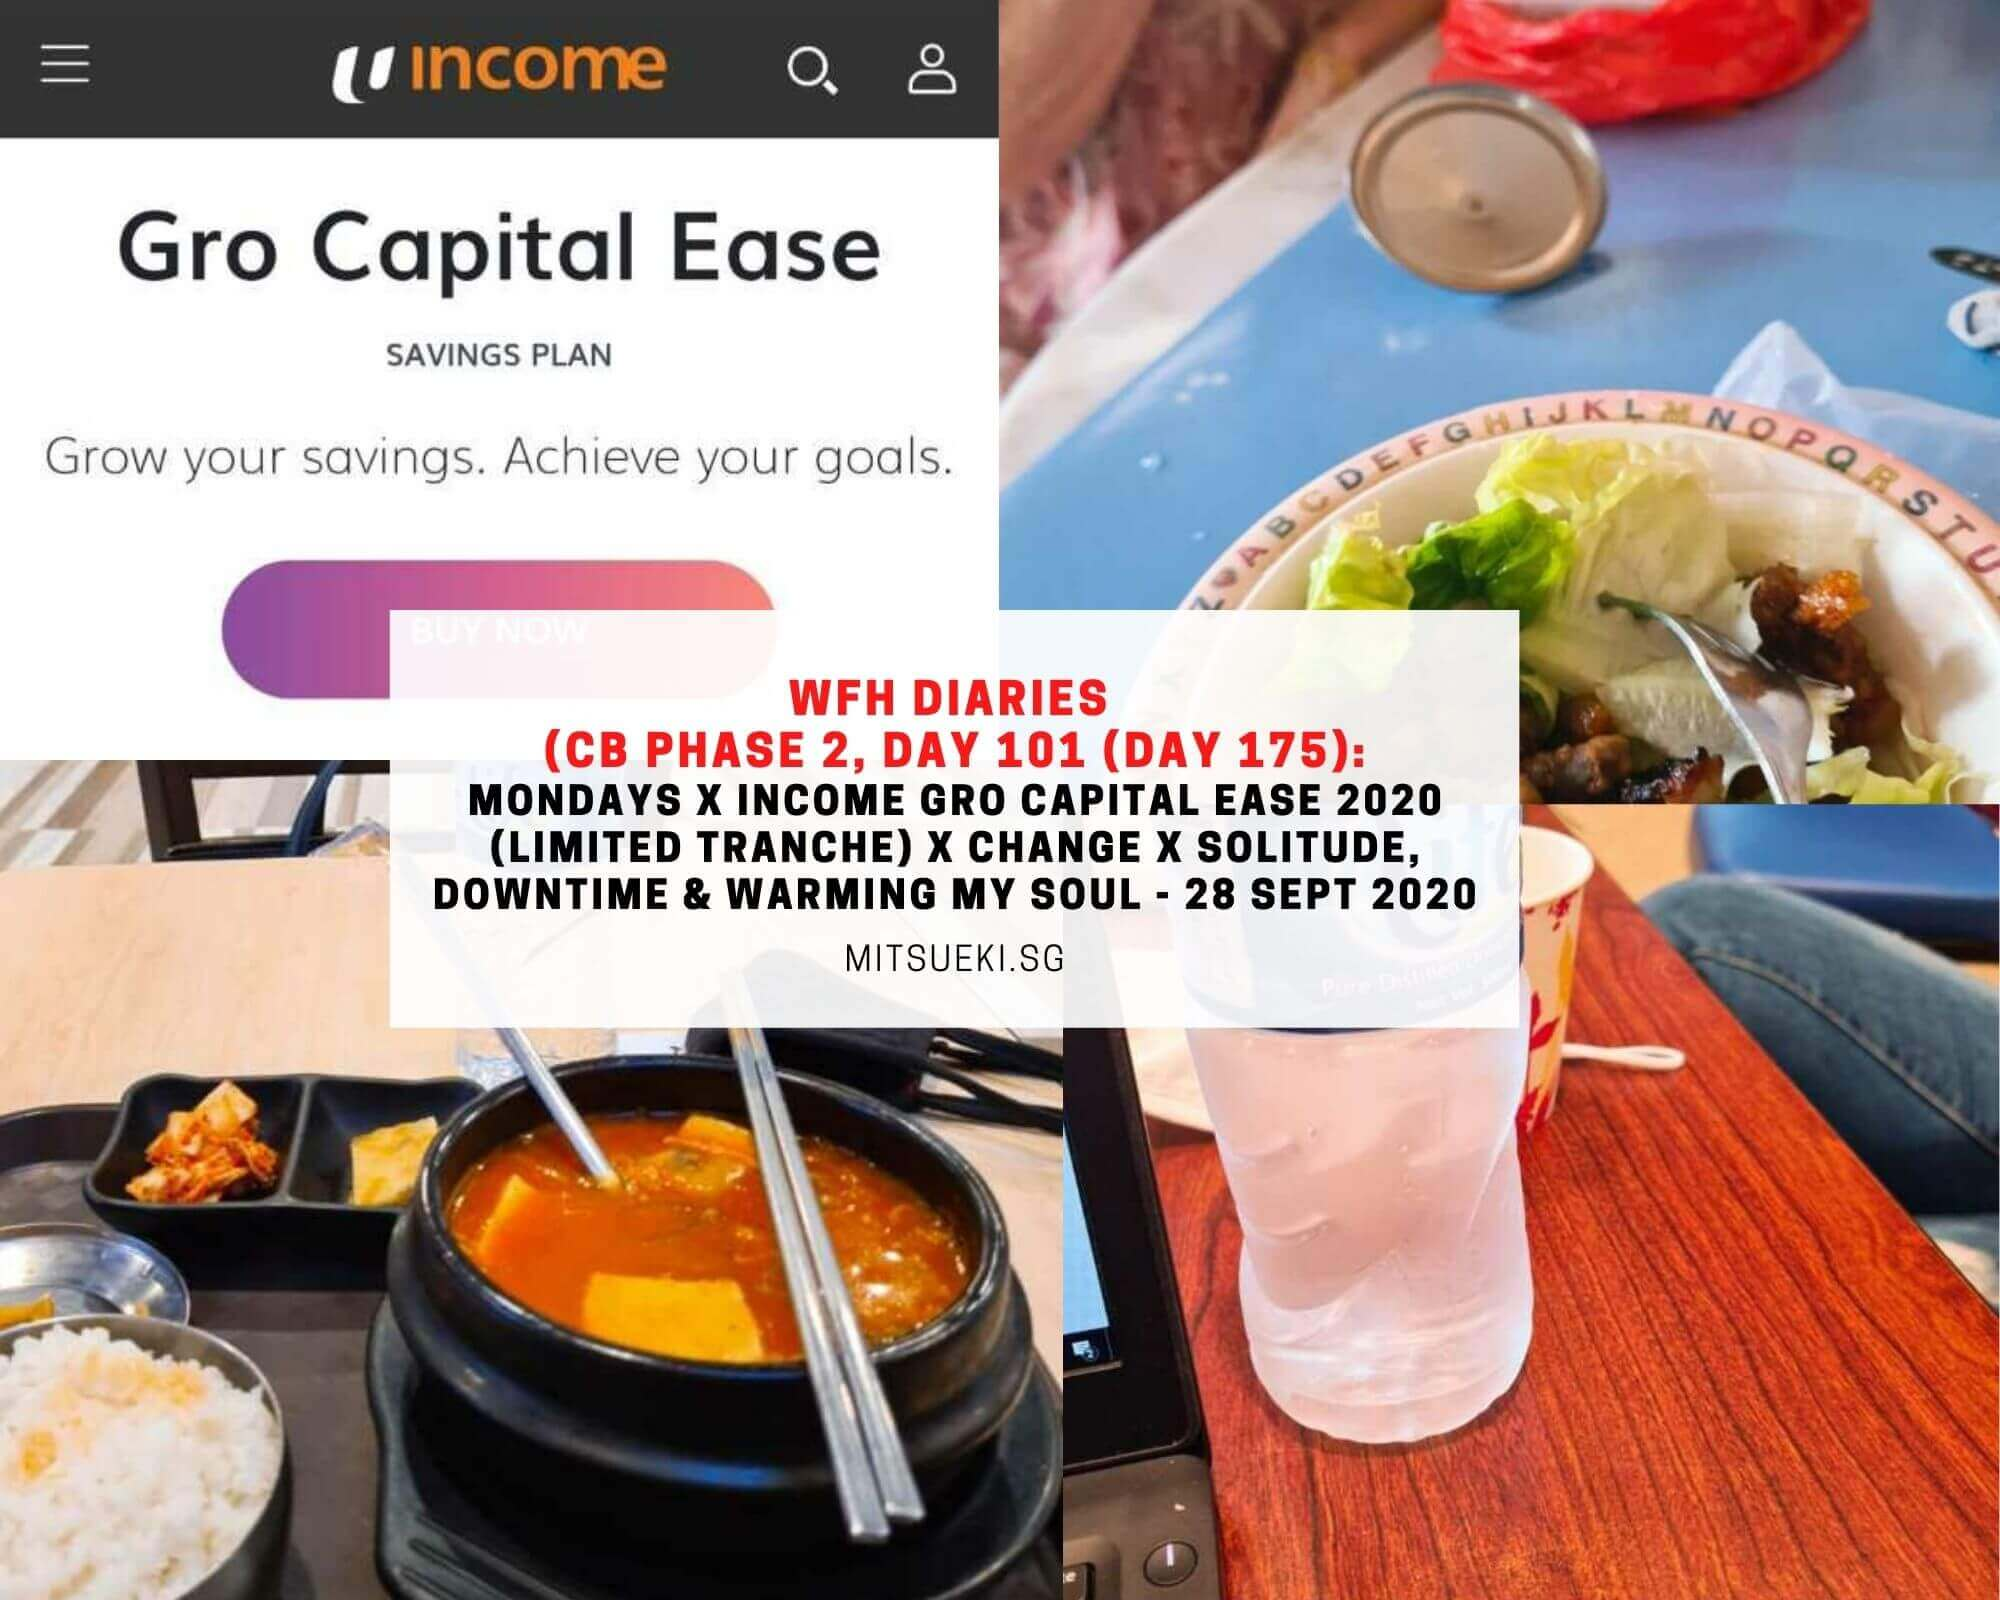 wfh diaries income gro capital ease